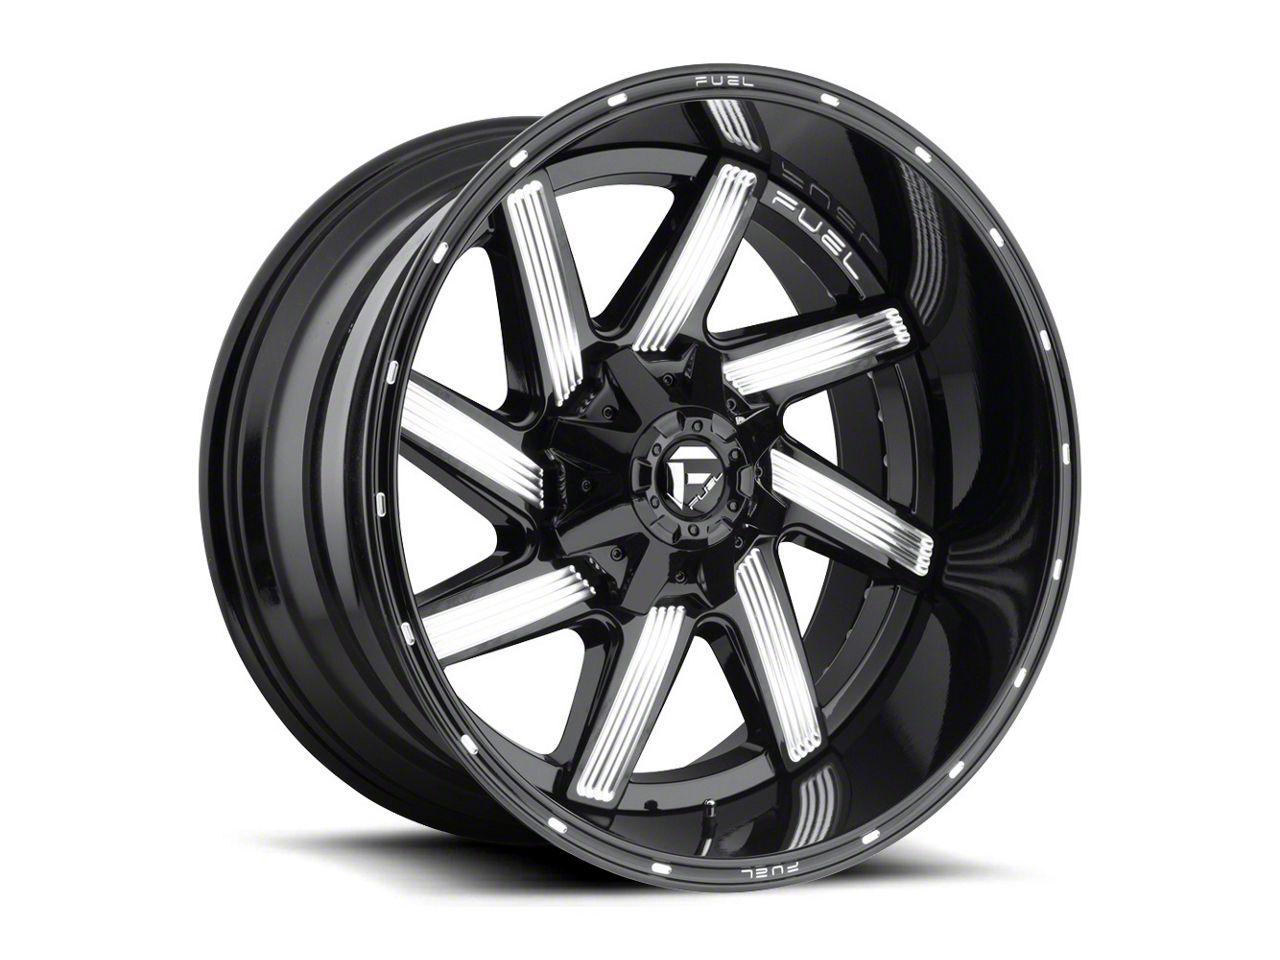 Fuel Wheels Moab Gloss Black Milled Wheel - 20x10 (87-06 Jeep Wrangler YJ & TJ)